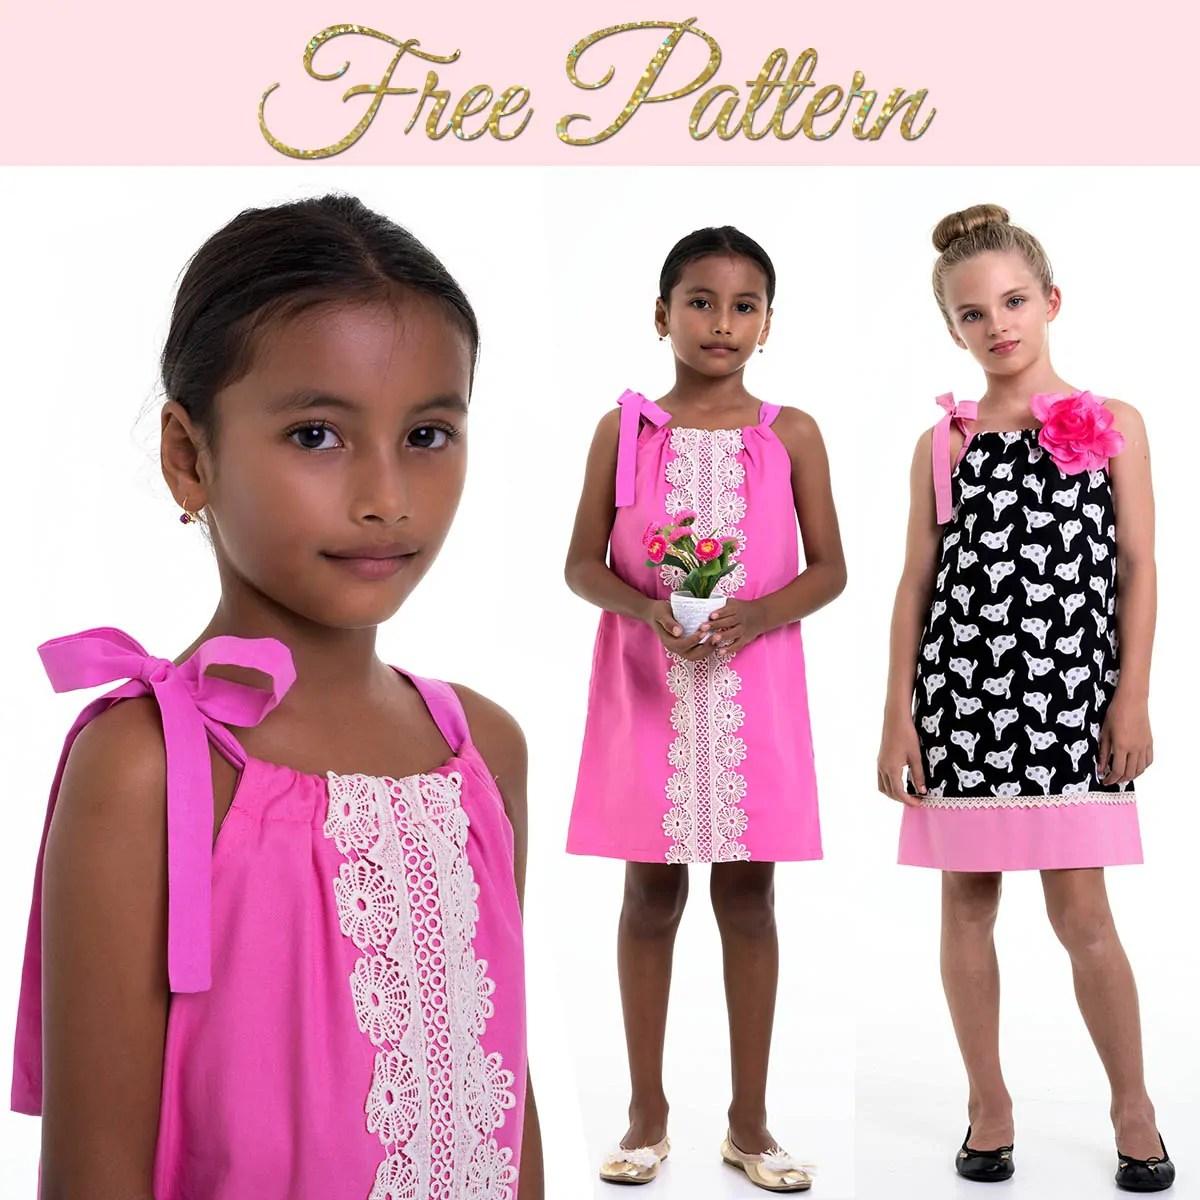 Pillowcase Dress Pattern Free Dress Pattern For Girls Treasurie